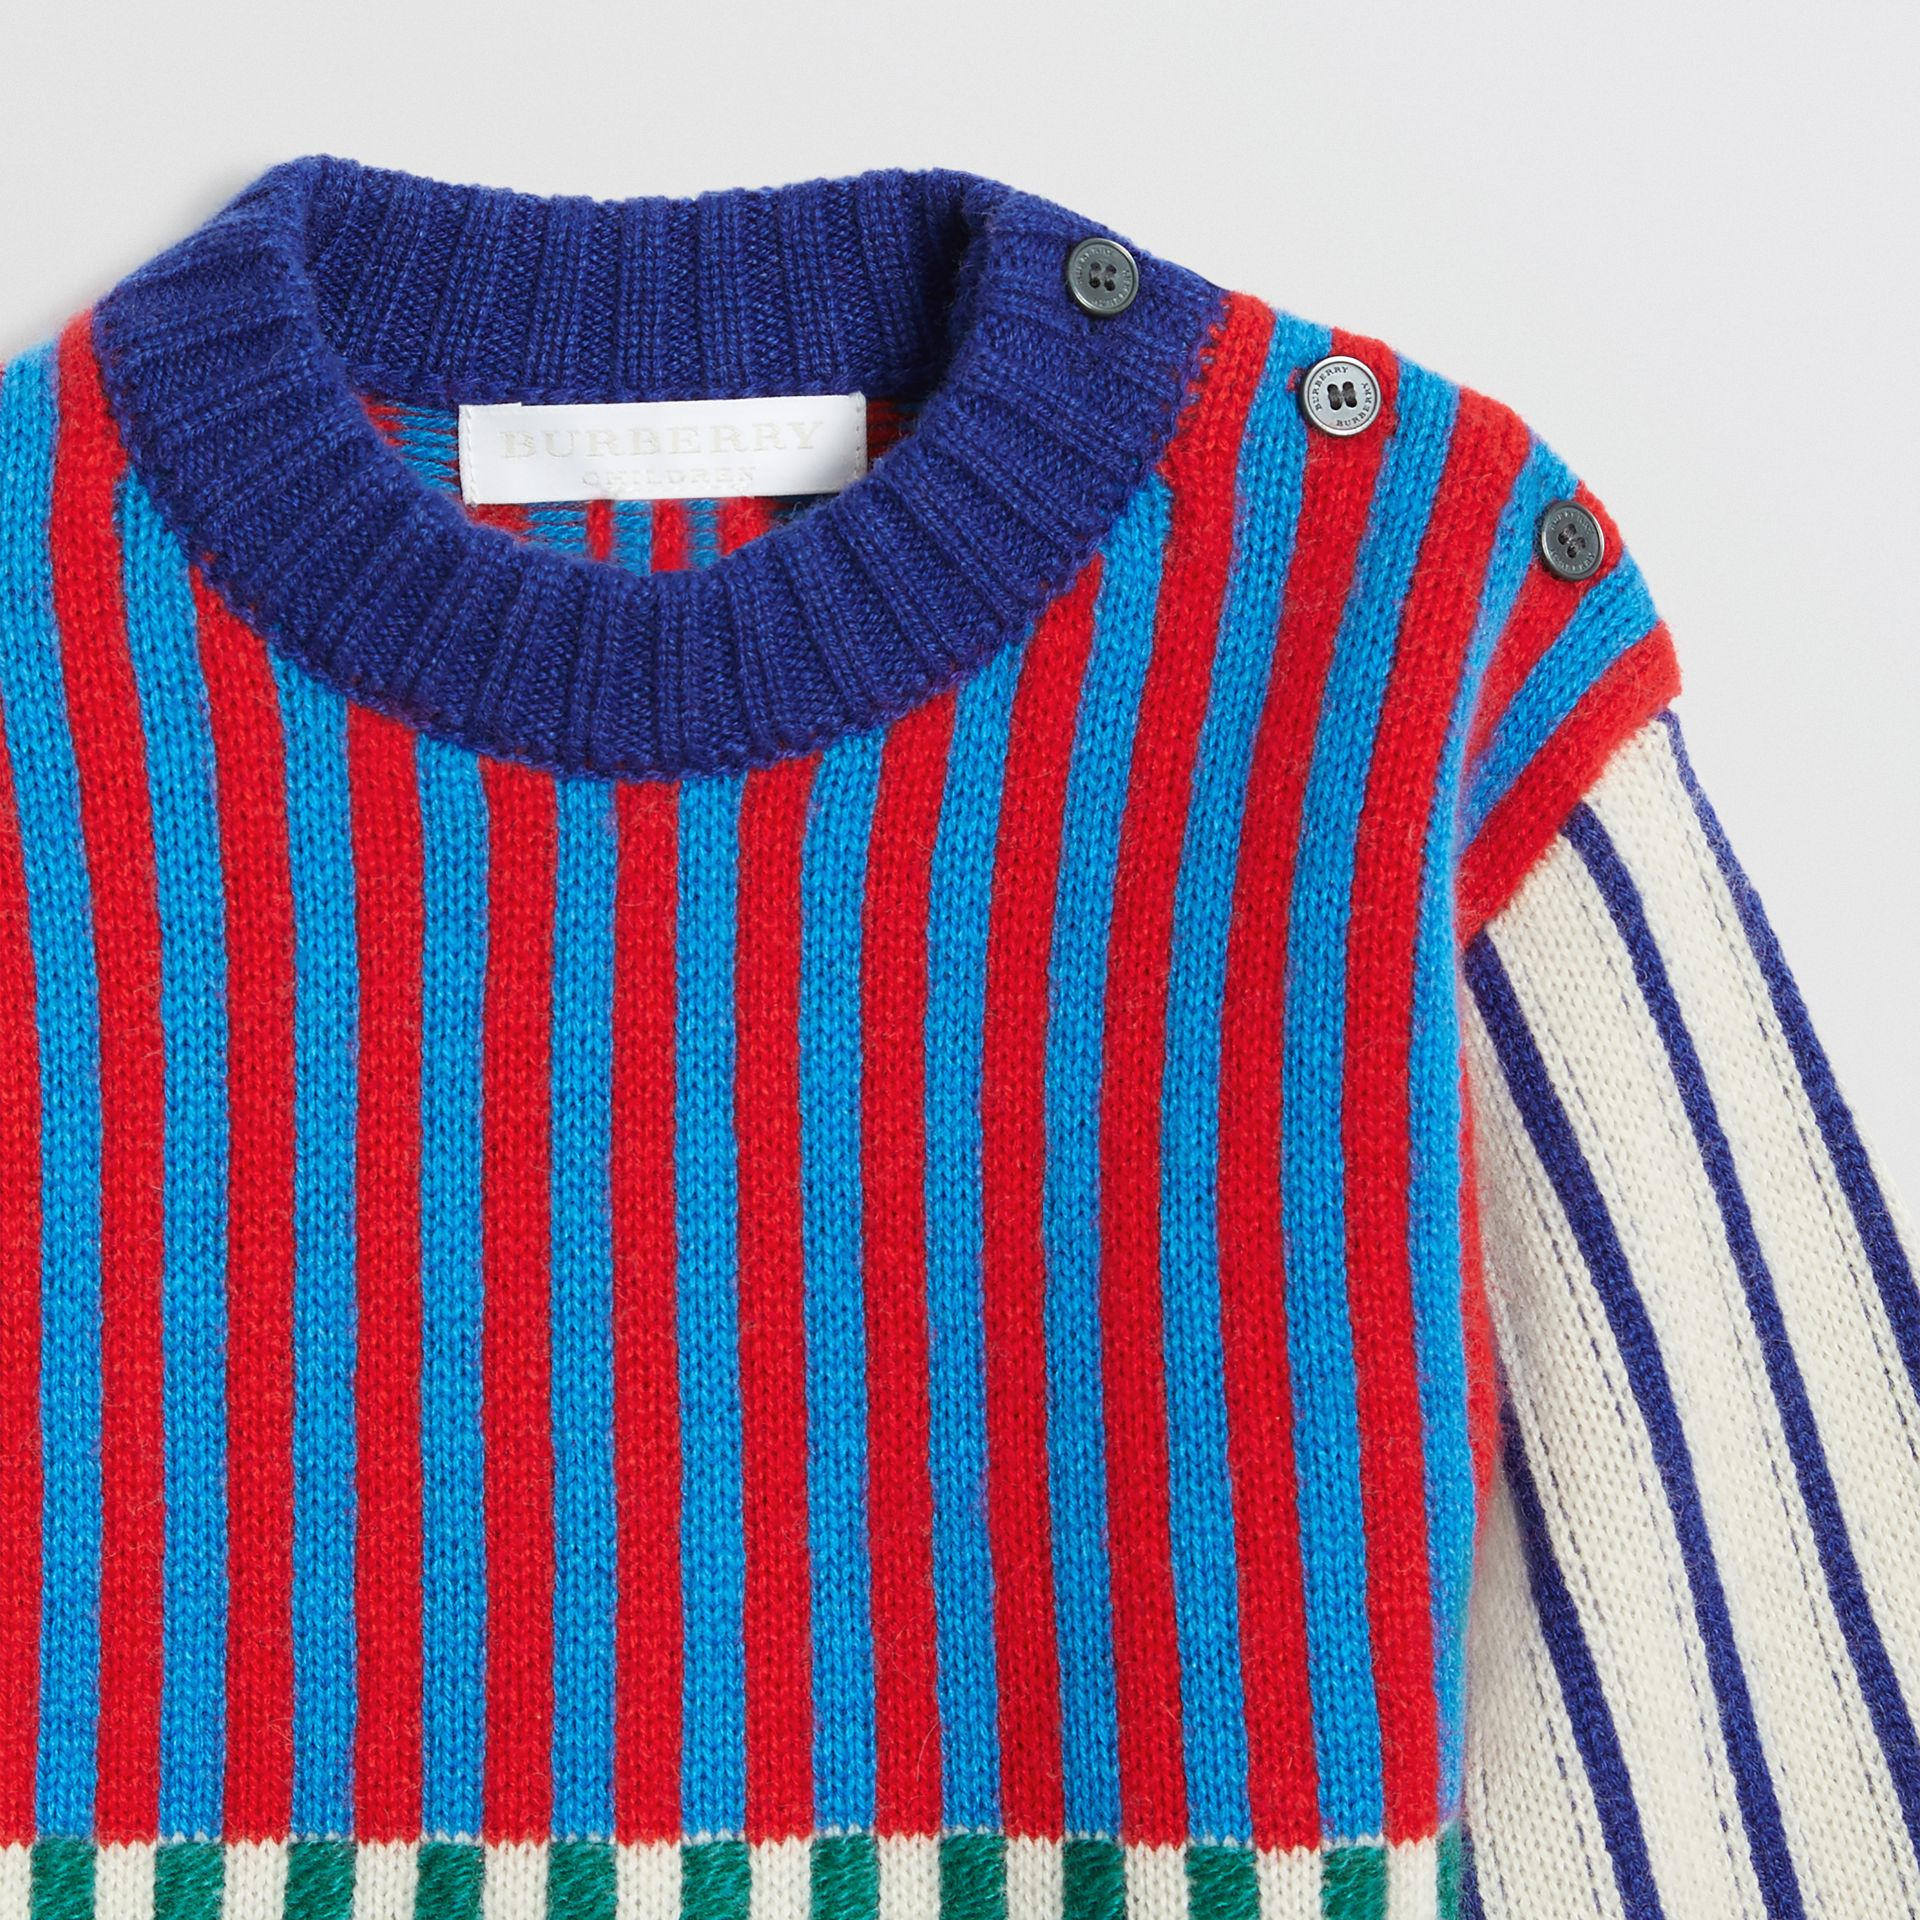 Graphic Cashmere Jacquard Sweater in Multicolour - Children | Burberry United Kingdom - gallery image 4